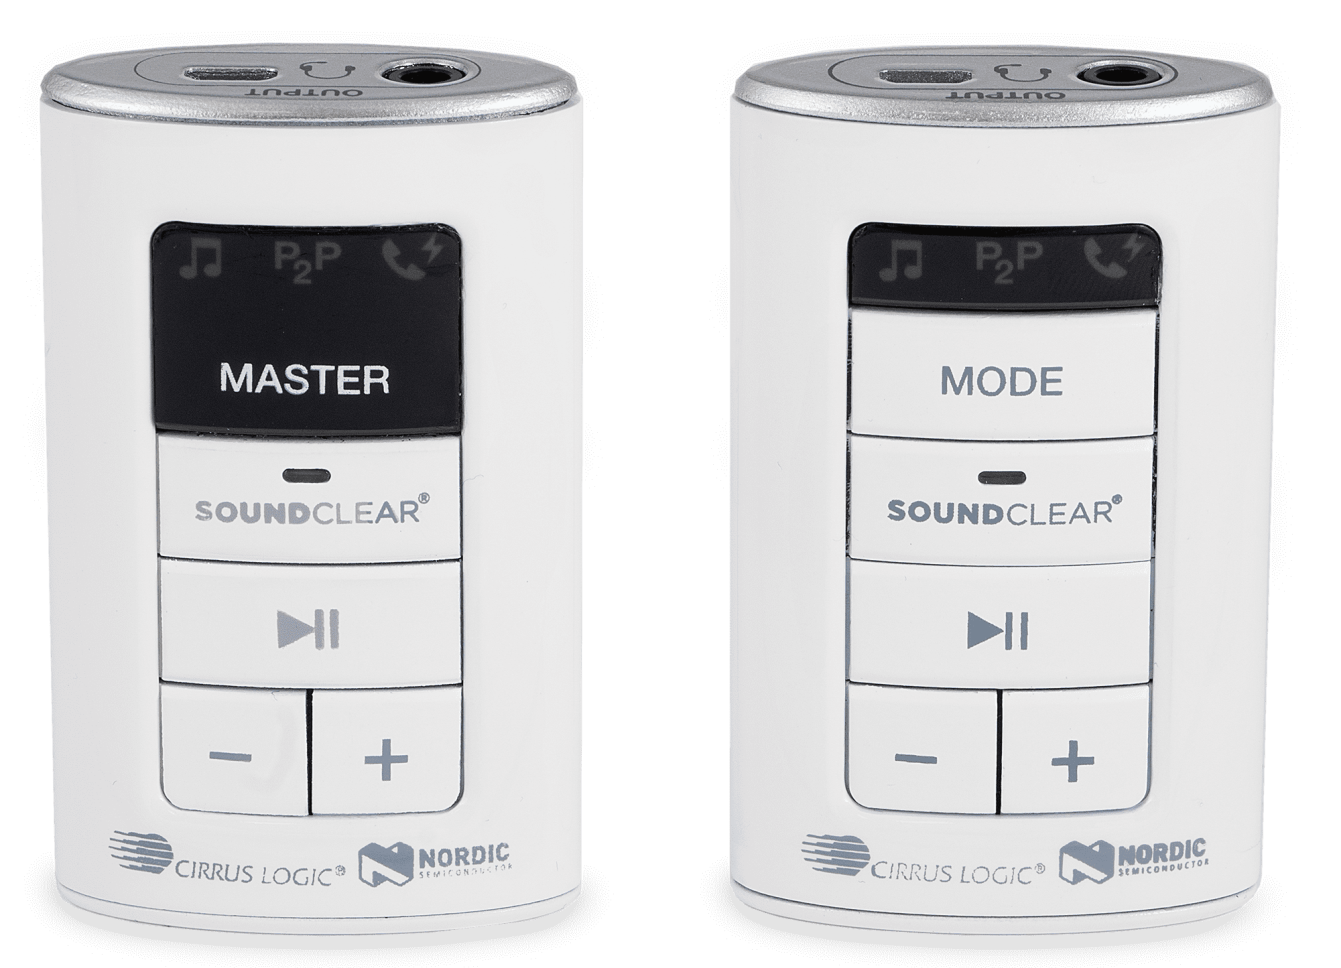 Nordic Semiconductor率先发布蓝牙LE Audio评测平台